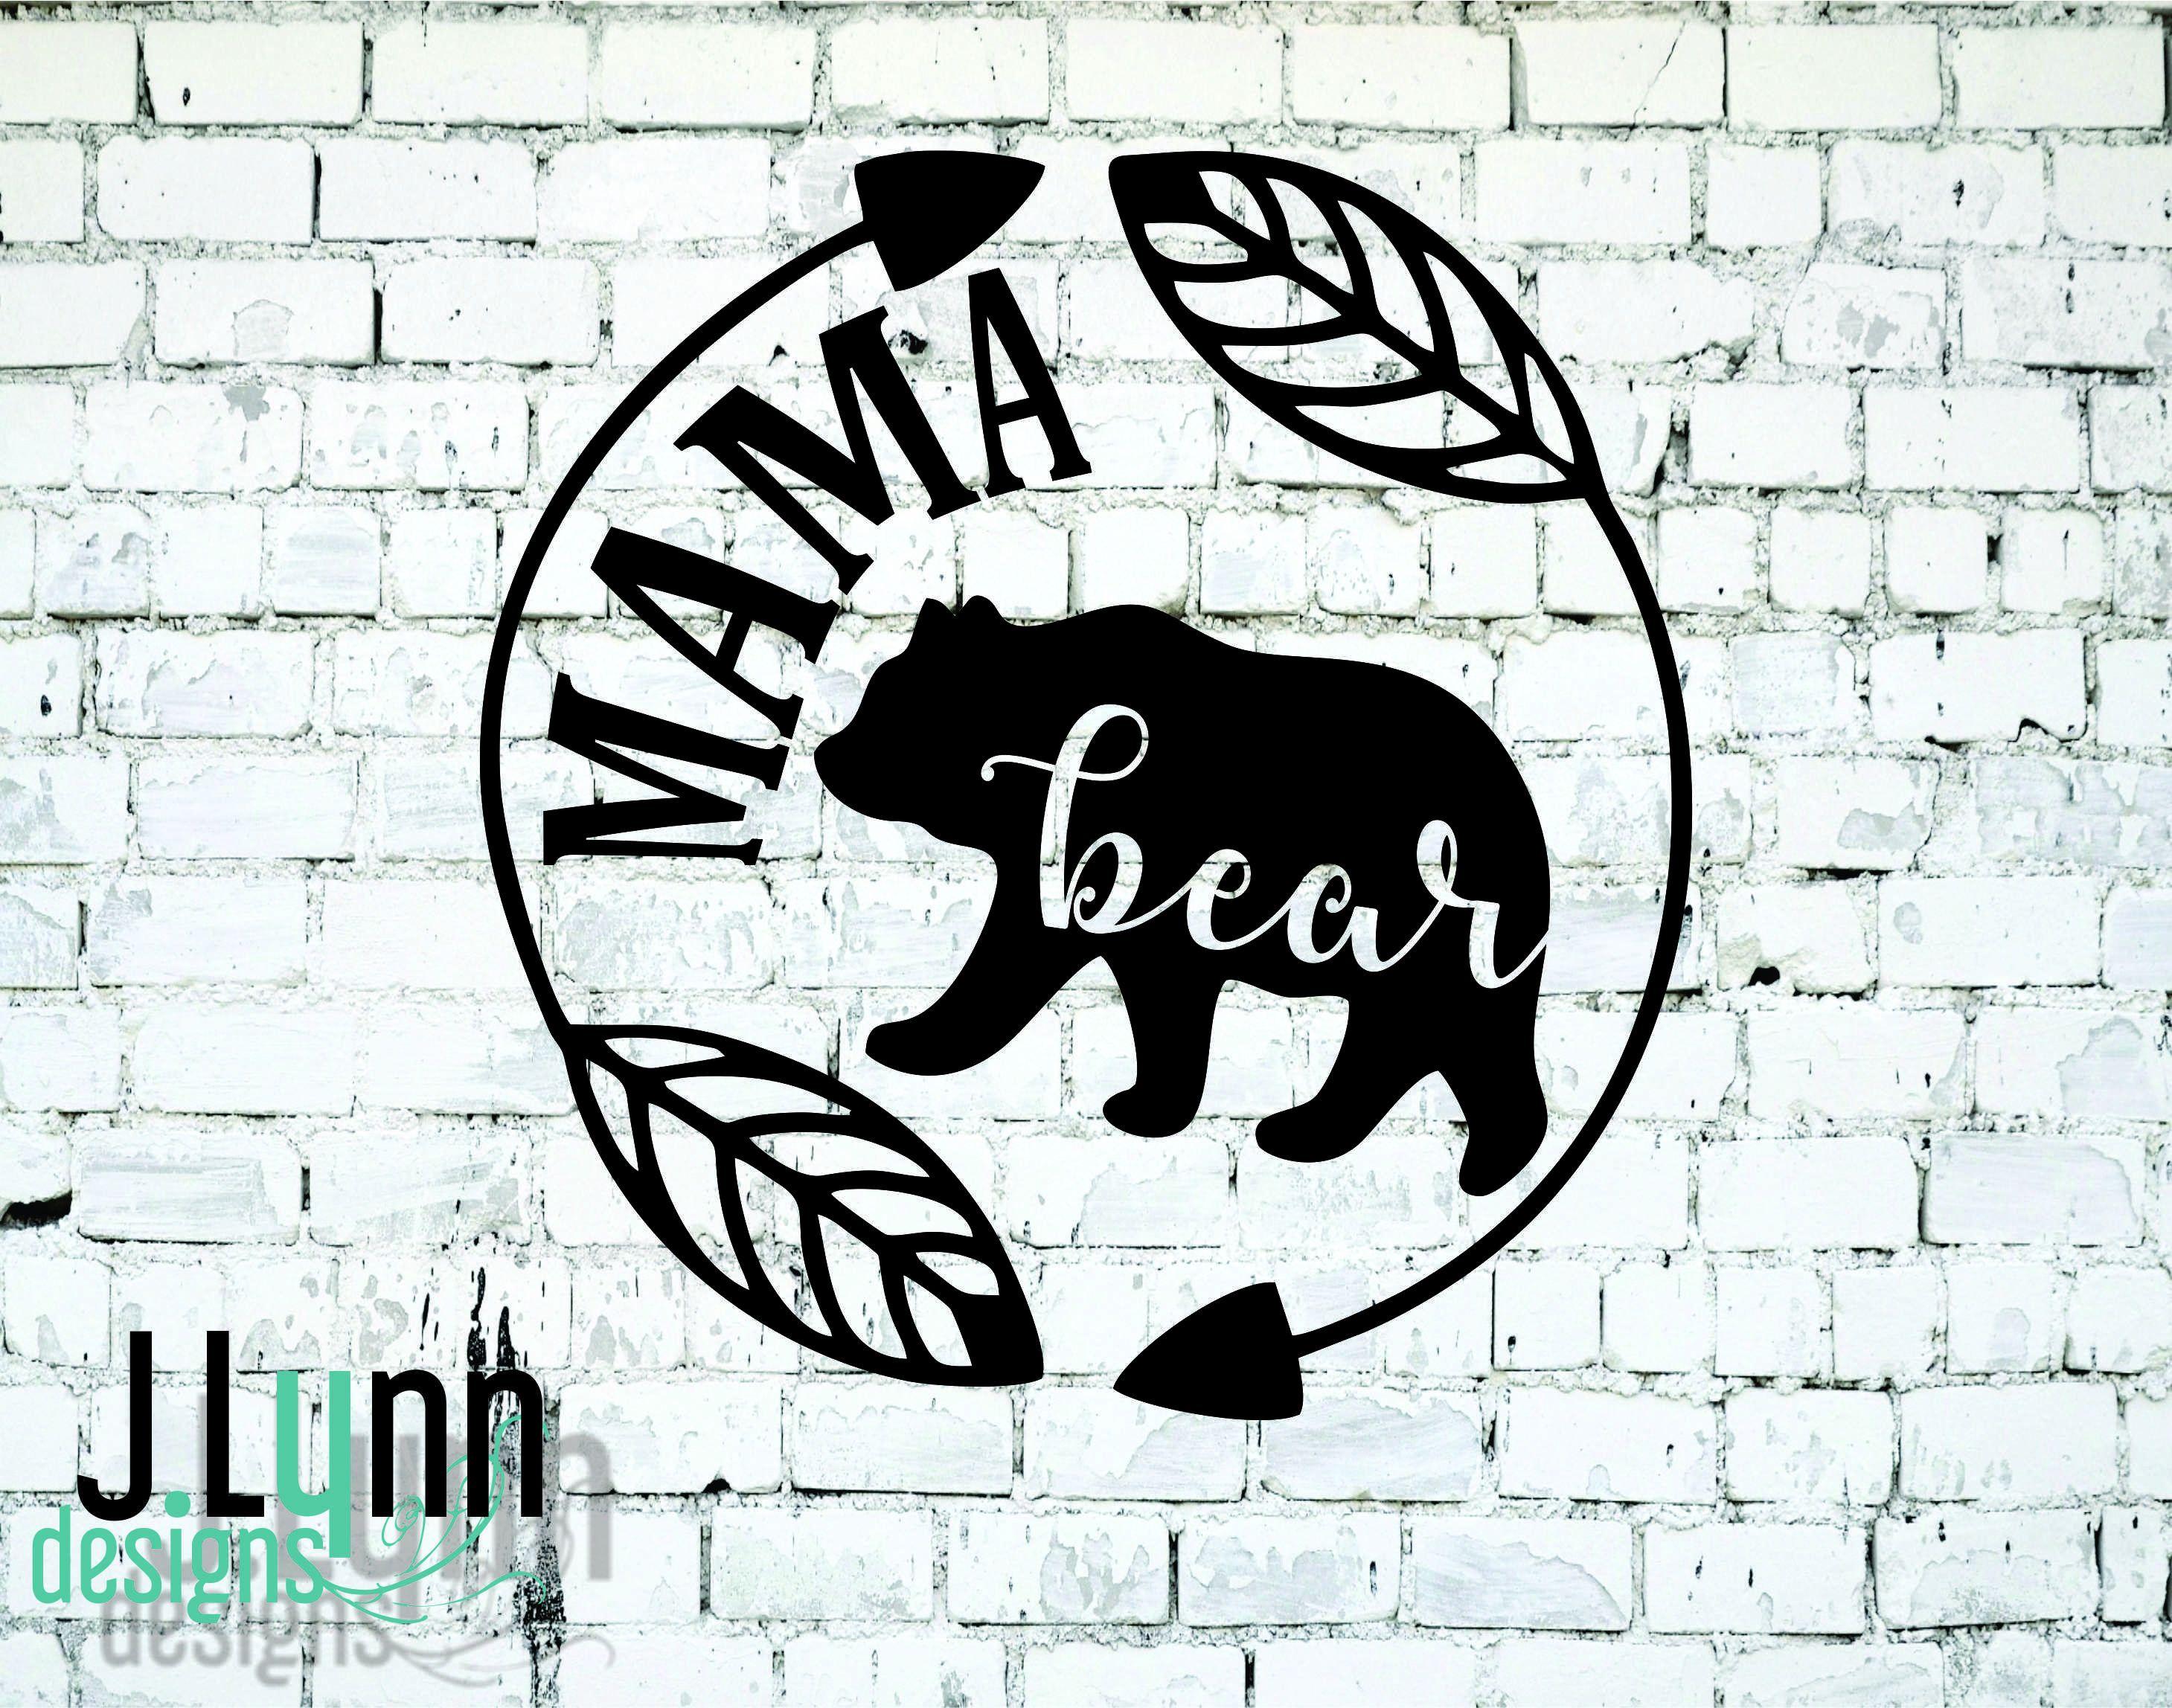 Holographic Mama Vinyl Decal Mama Car Sticker Laptop Etsy Tumbler Decal Vinyl Decals Holographic [ 1080 x 1080 Pixel ]